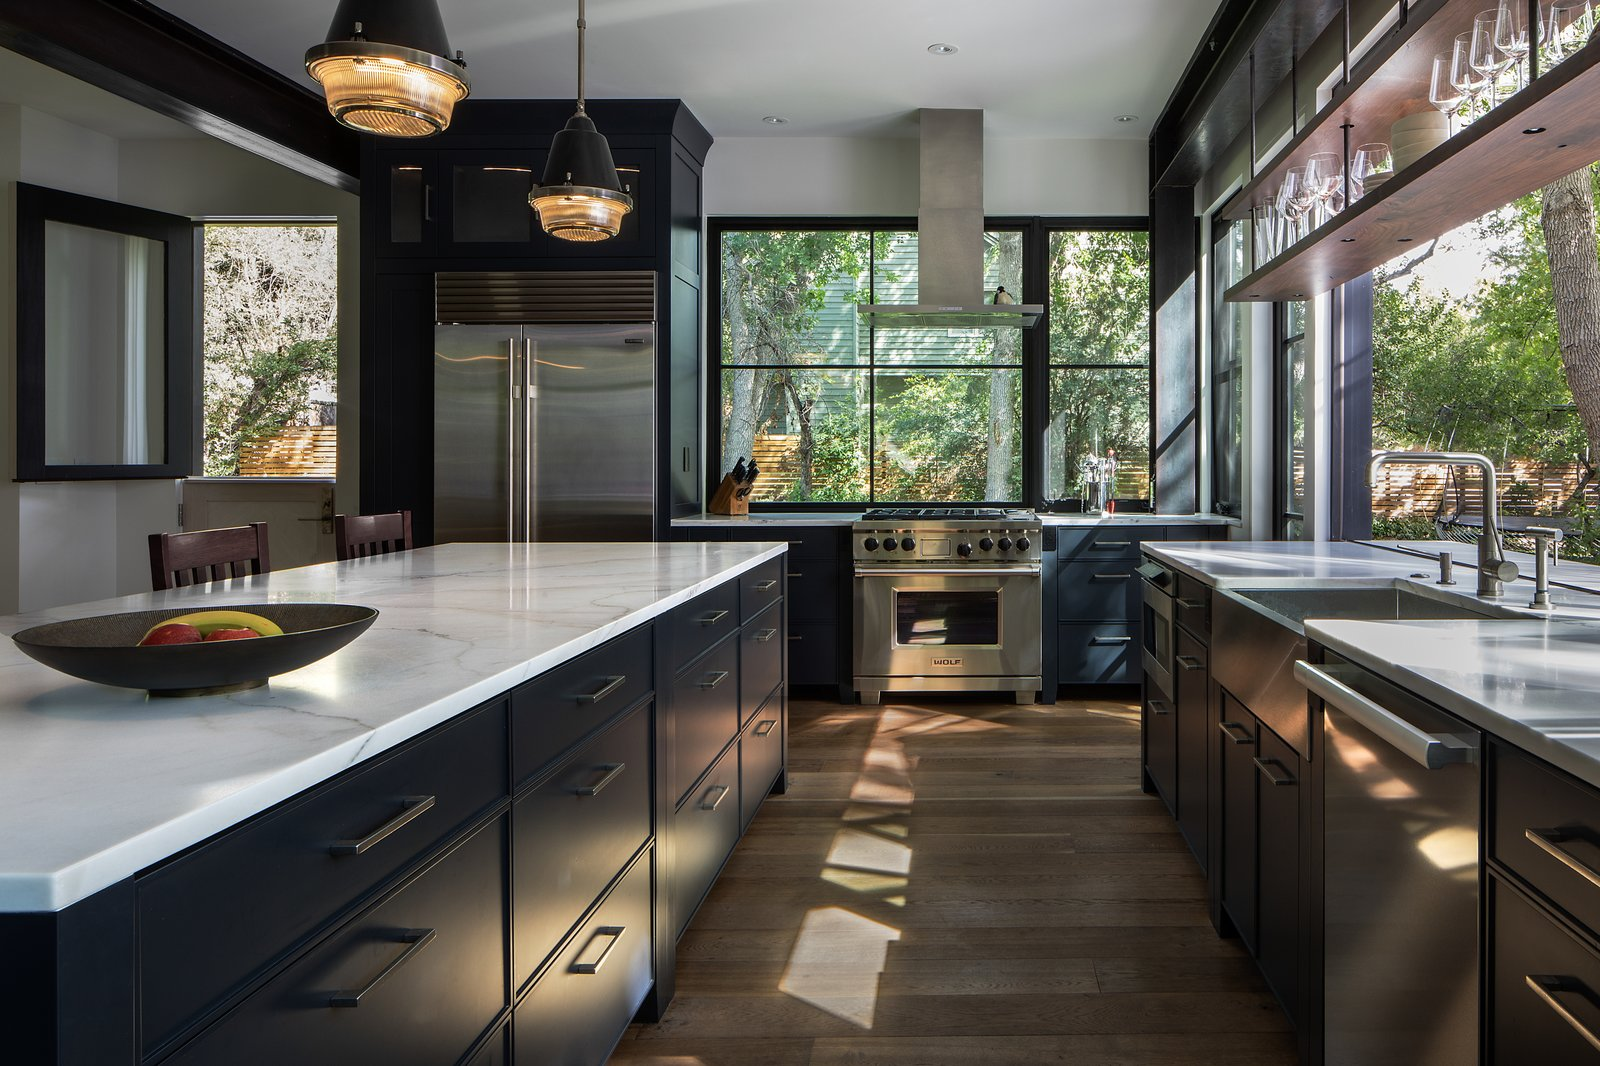 Modern farmhouse interior kitchen with range and range hood.